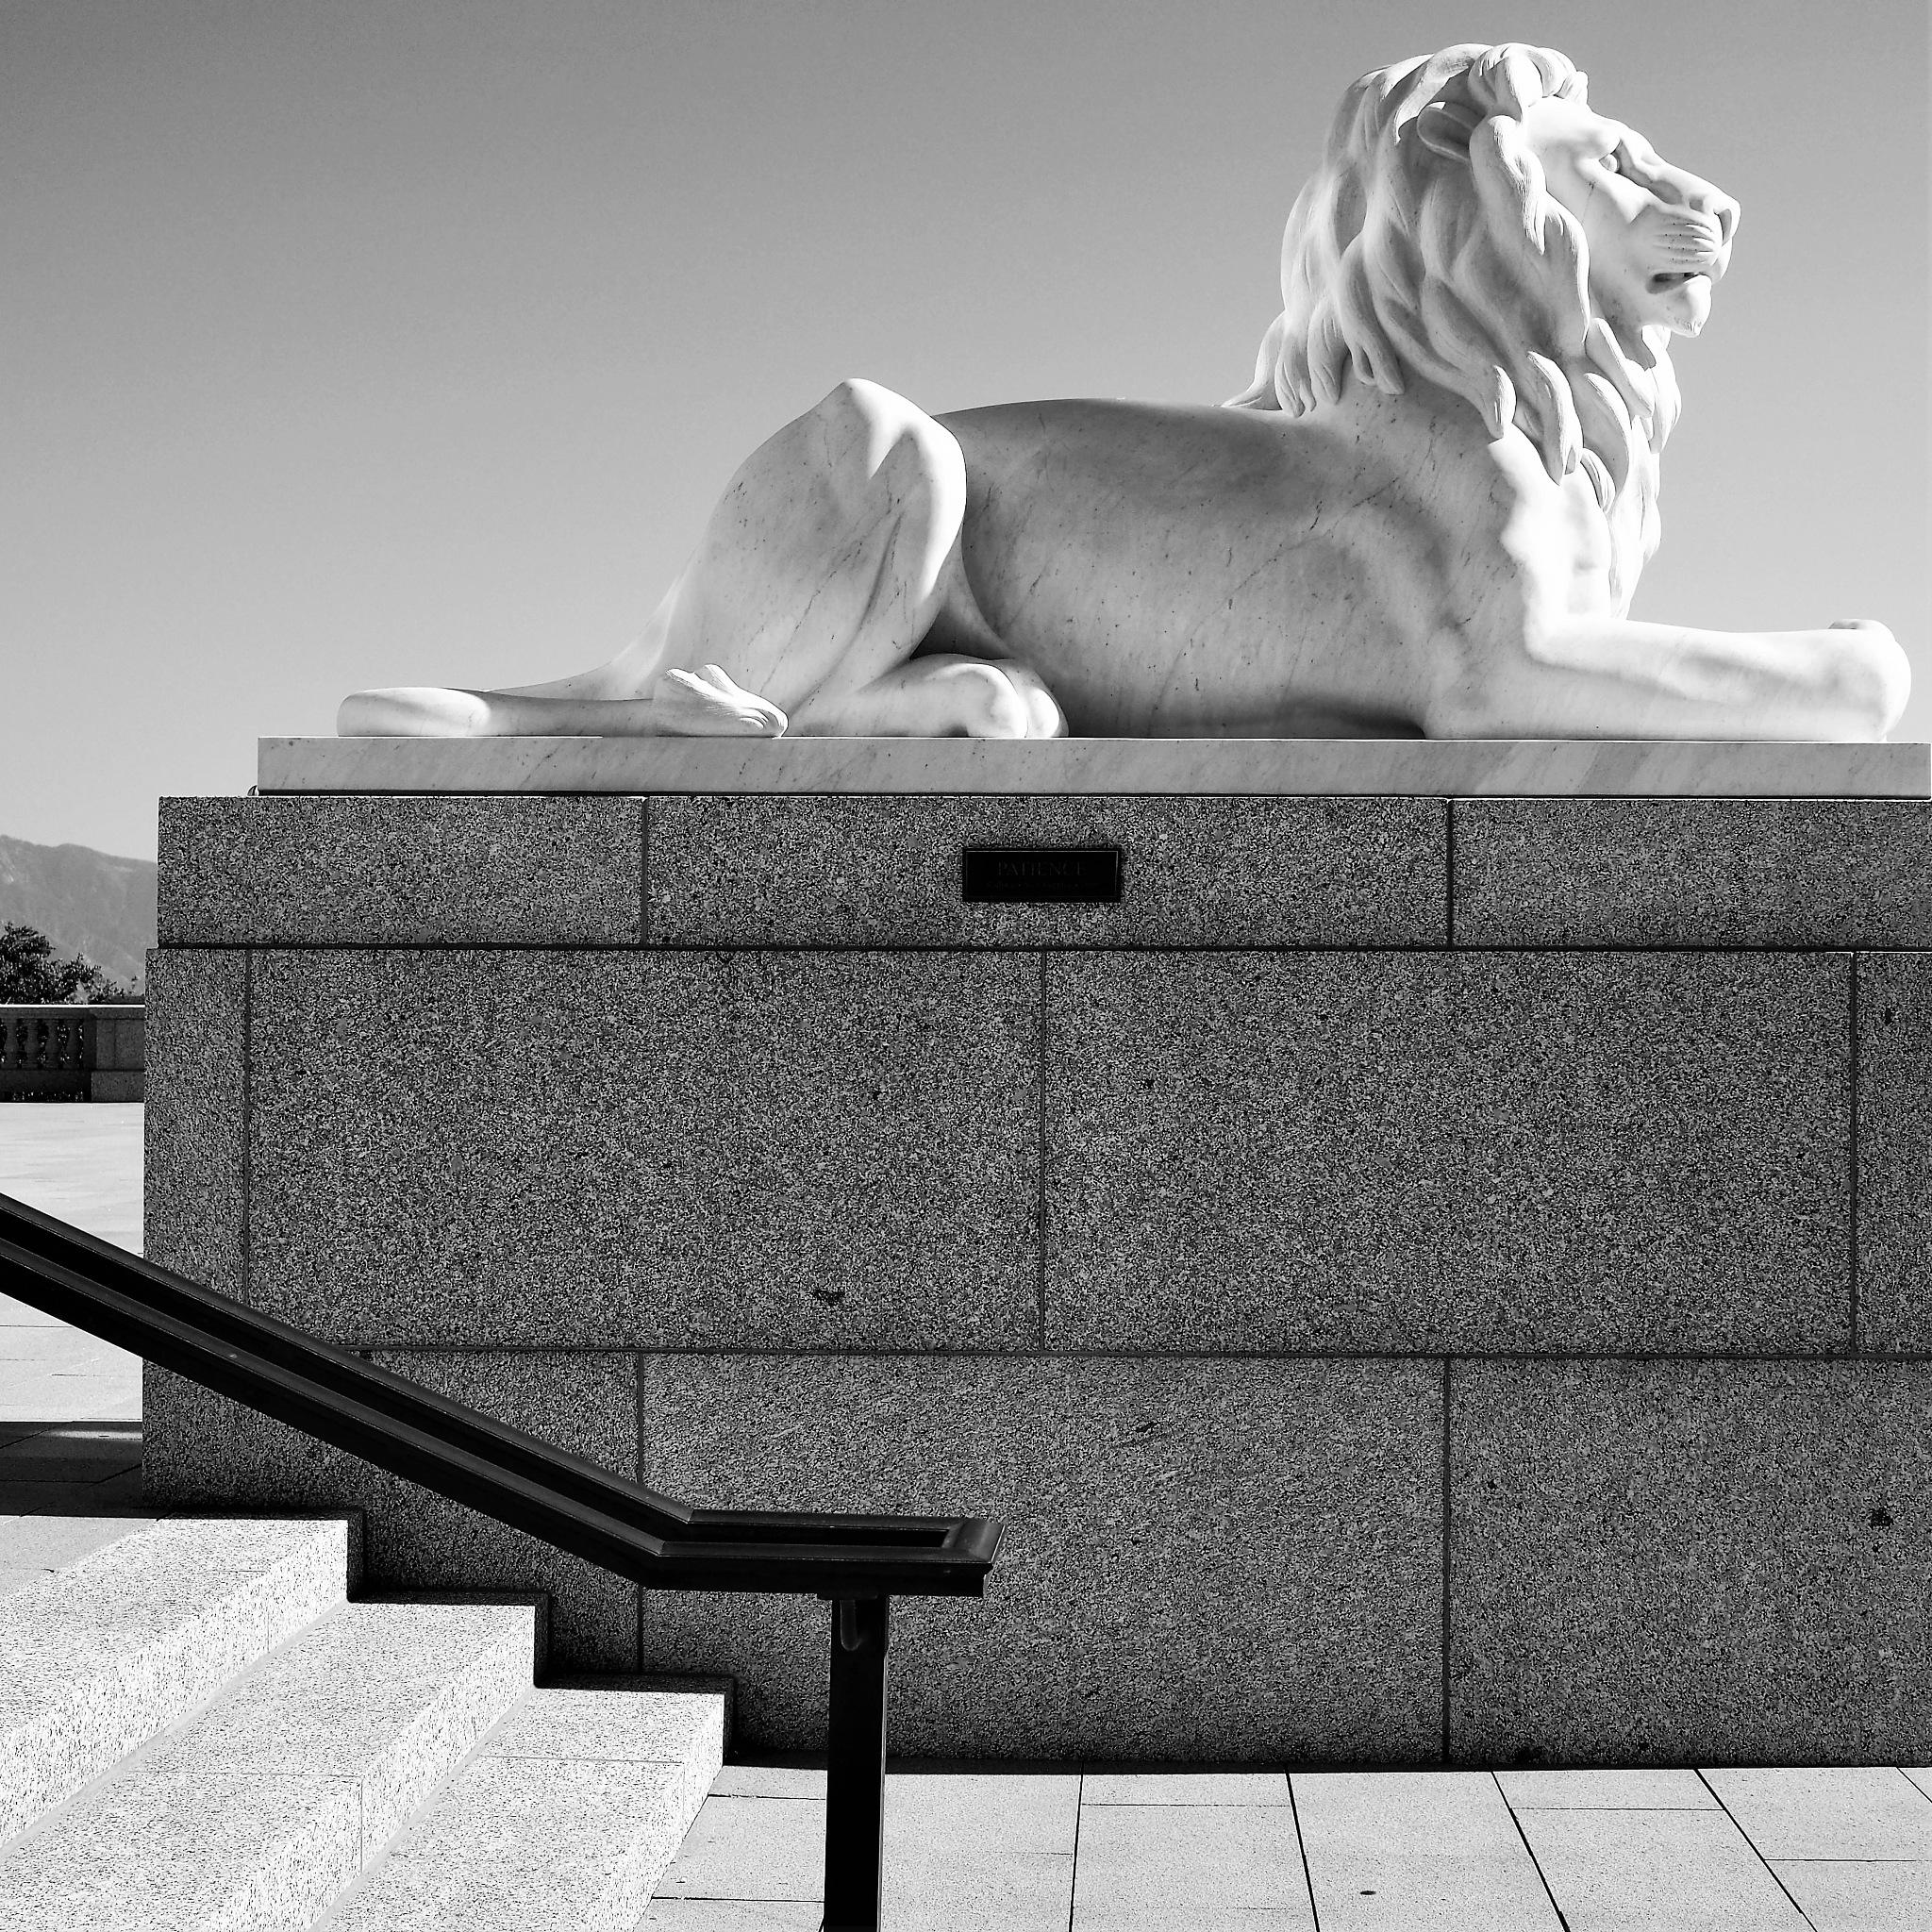 Le lion veille - Utah State Capitol building by Cathy Crégniot